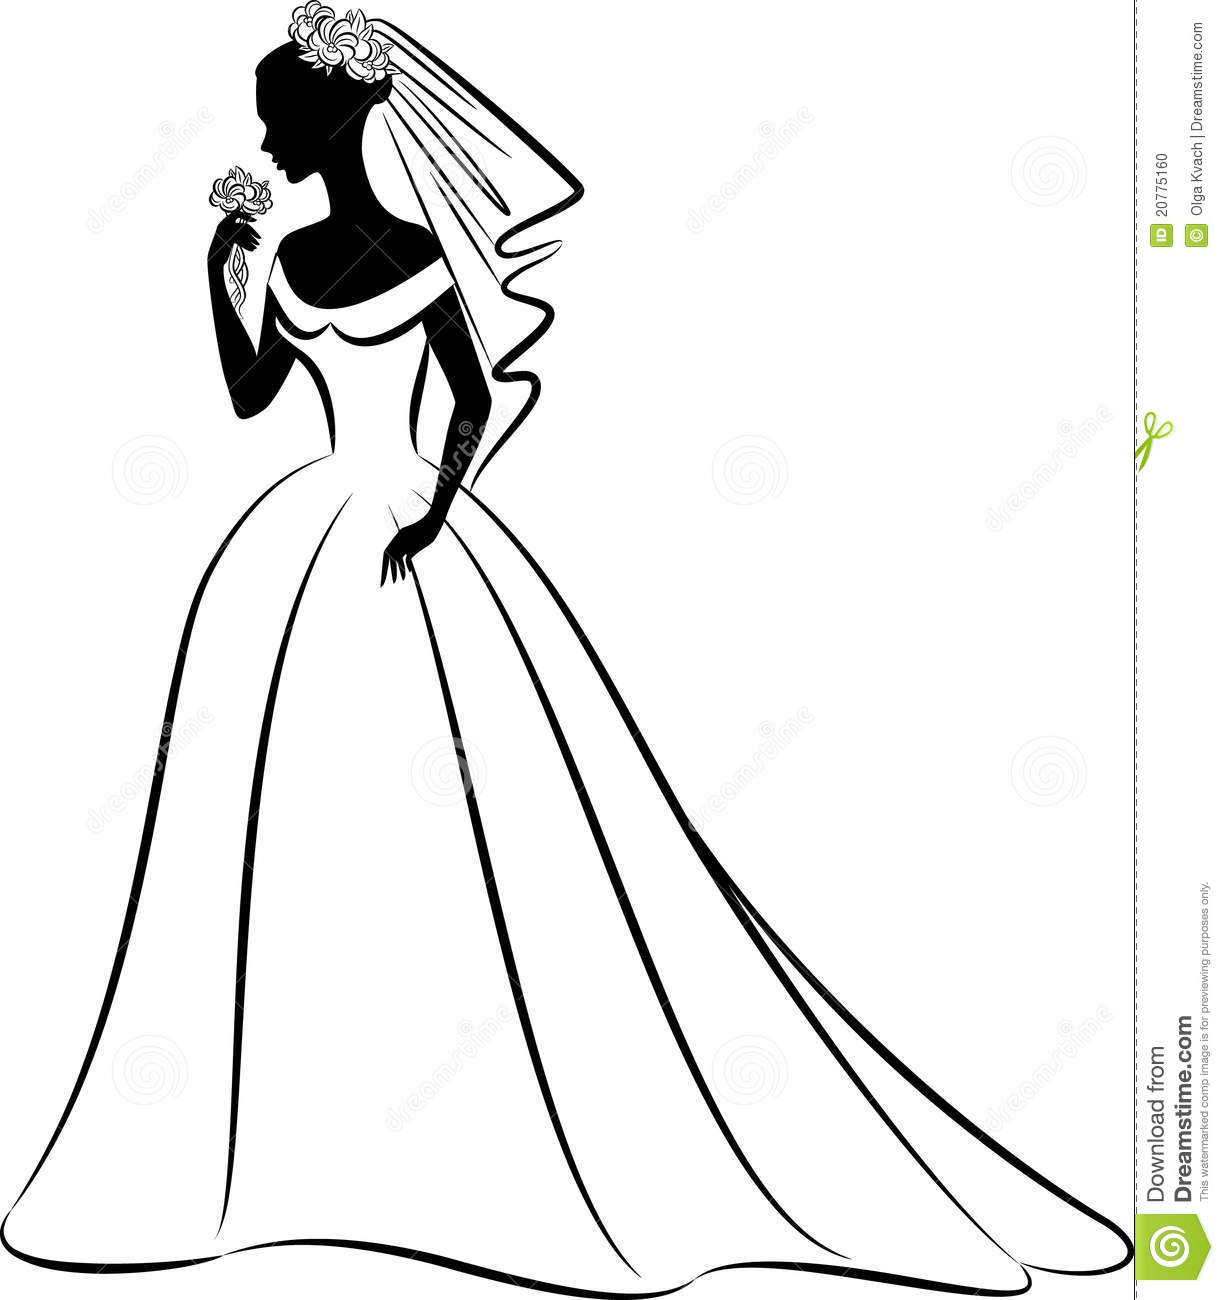 Vintage Wedding Dress Clipart Wedding Dress Clipart Outline Silhouette